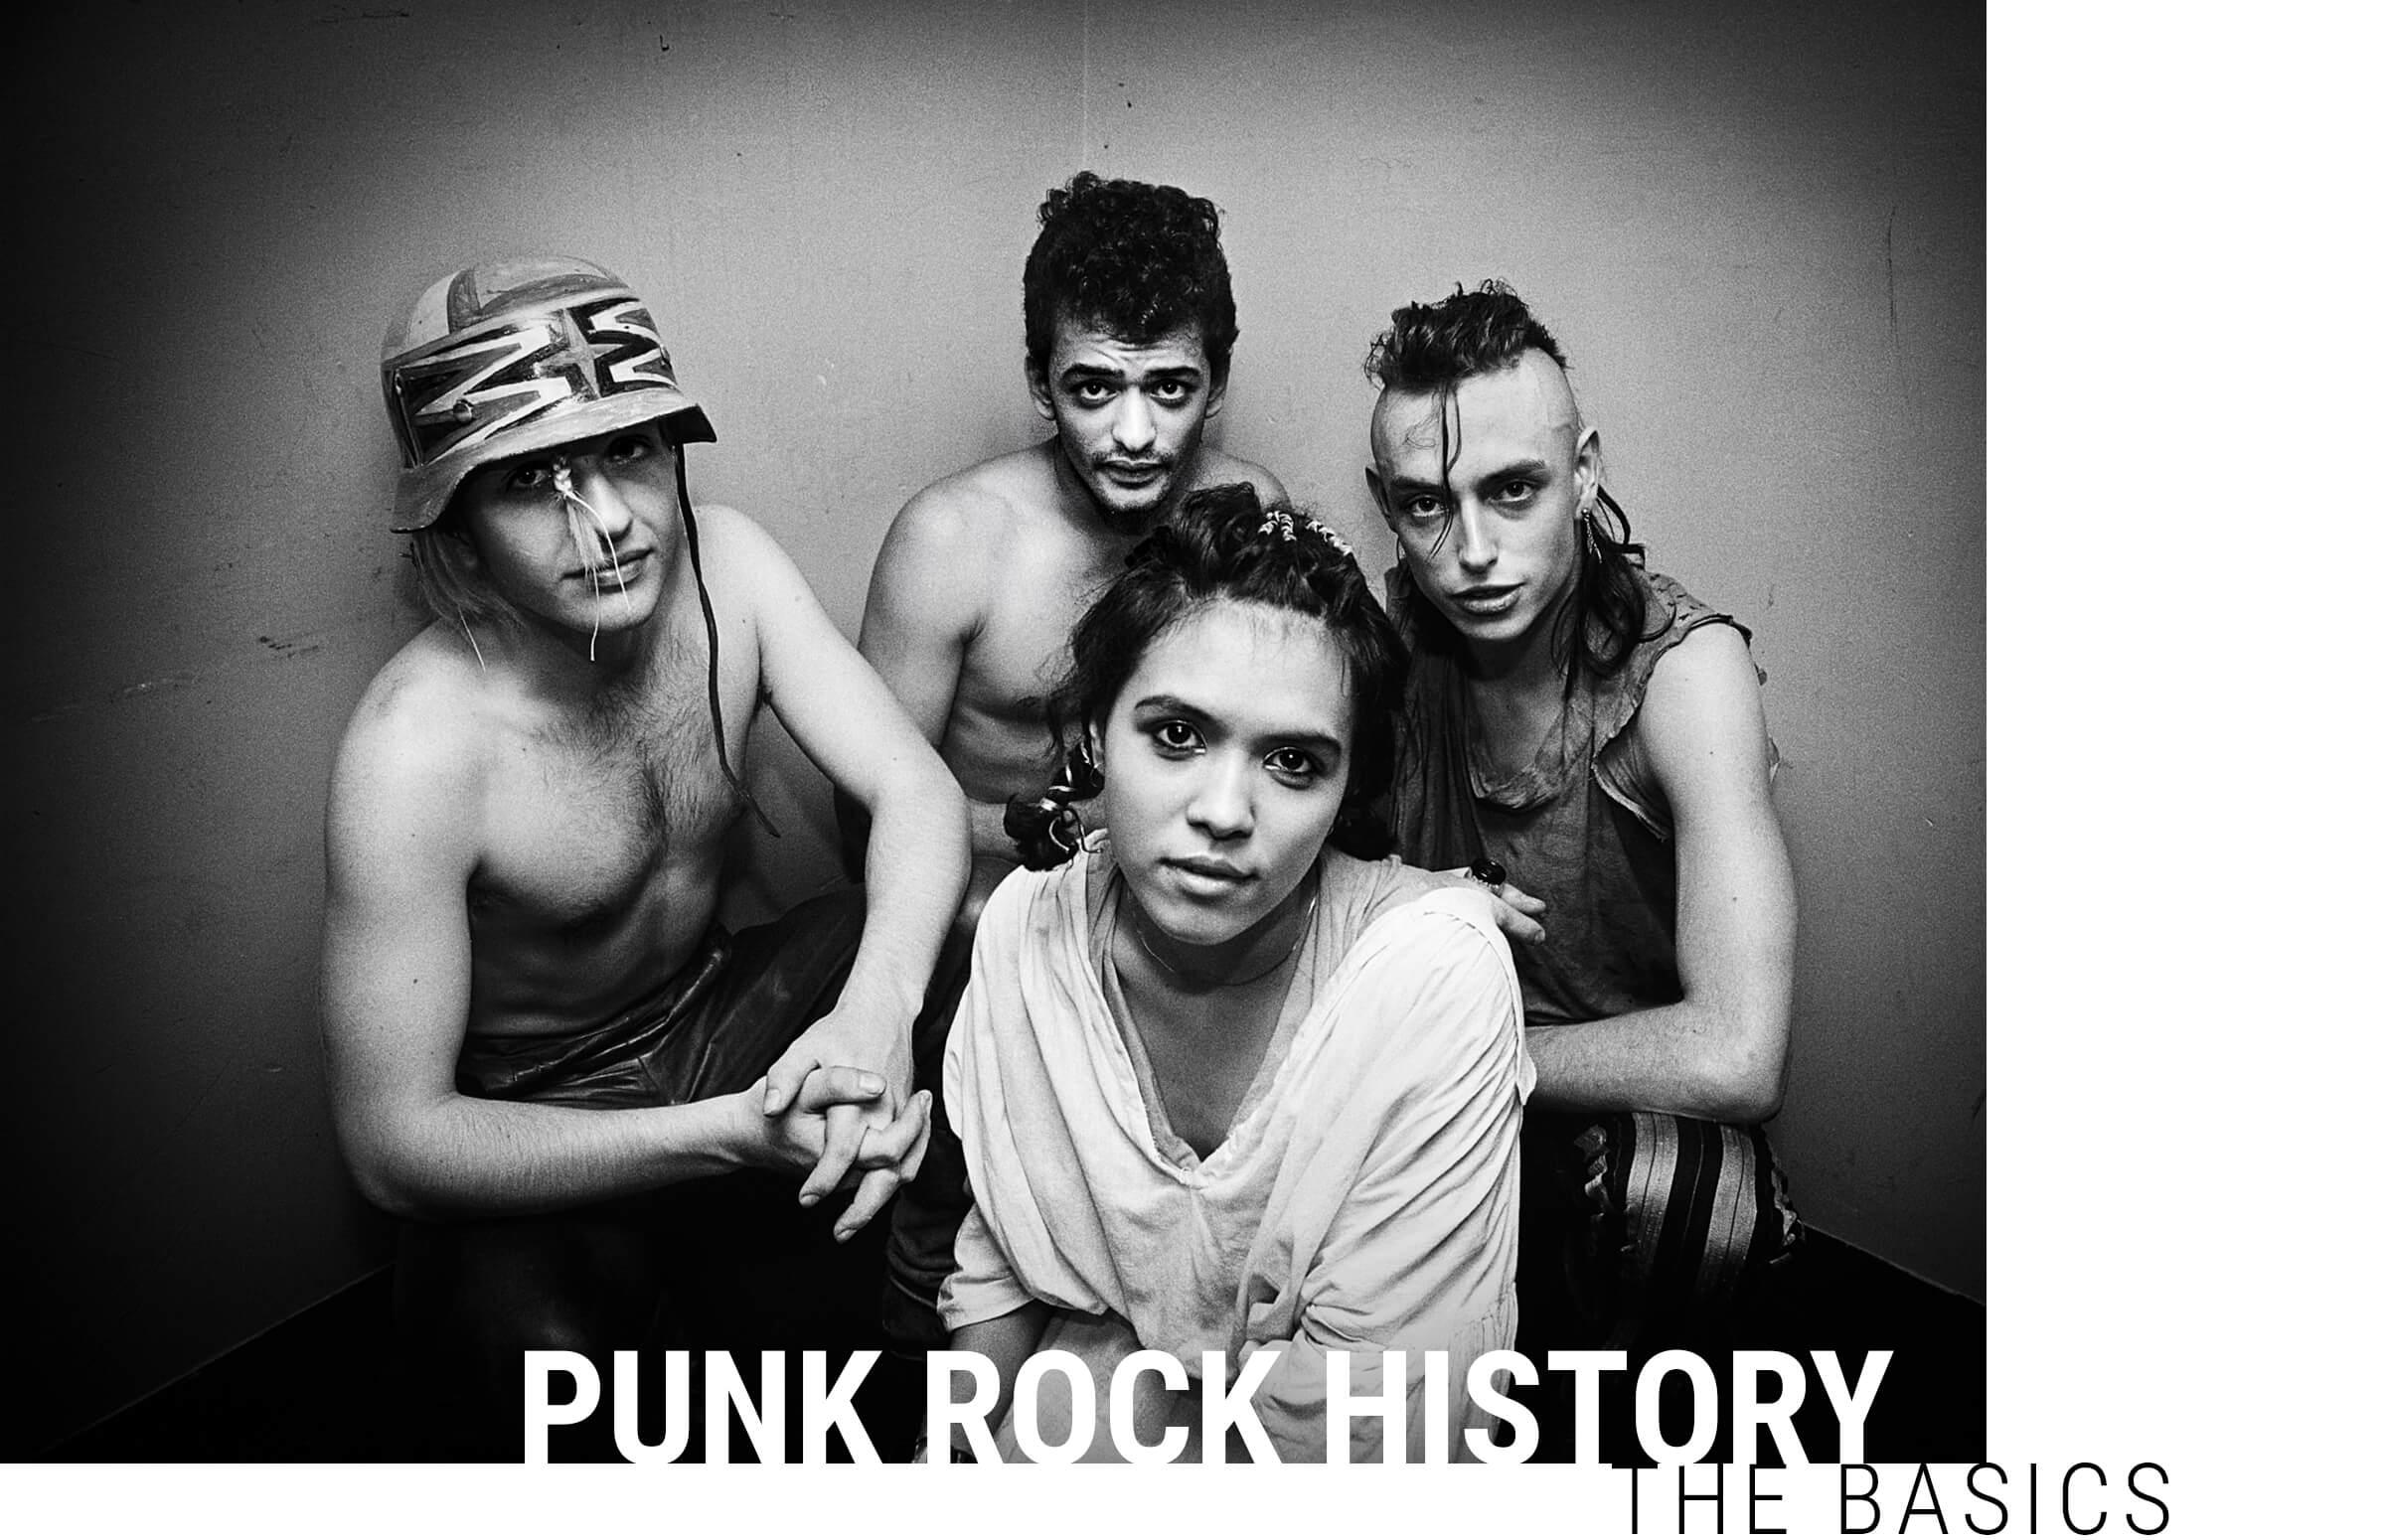 punk rock history